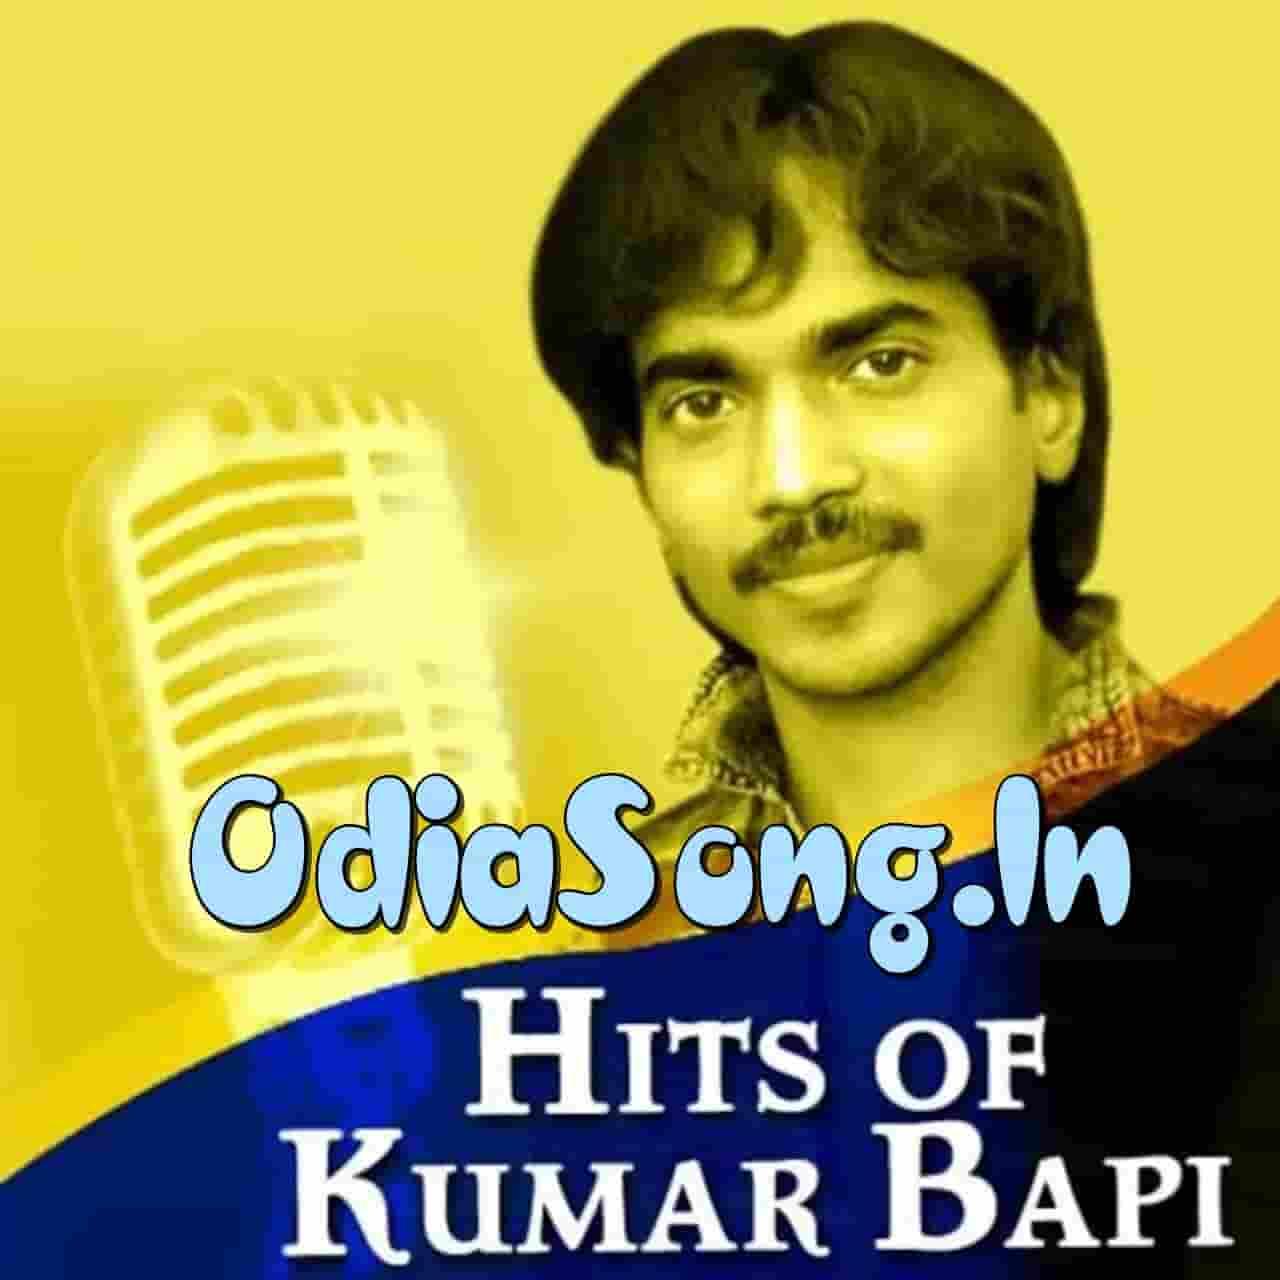 Mo Ghare Nahin Re Tope Basi Torani - Odia Bhajan Sad Song By Kumar Bapi